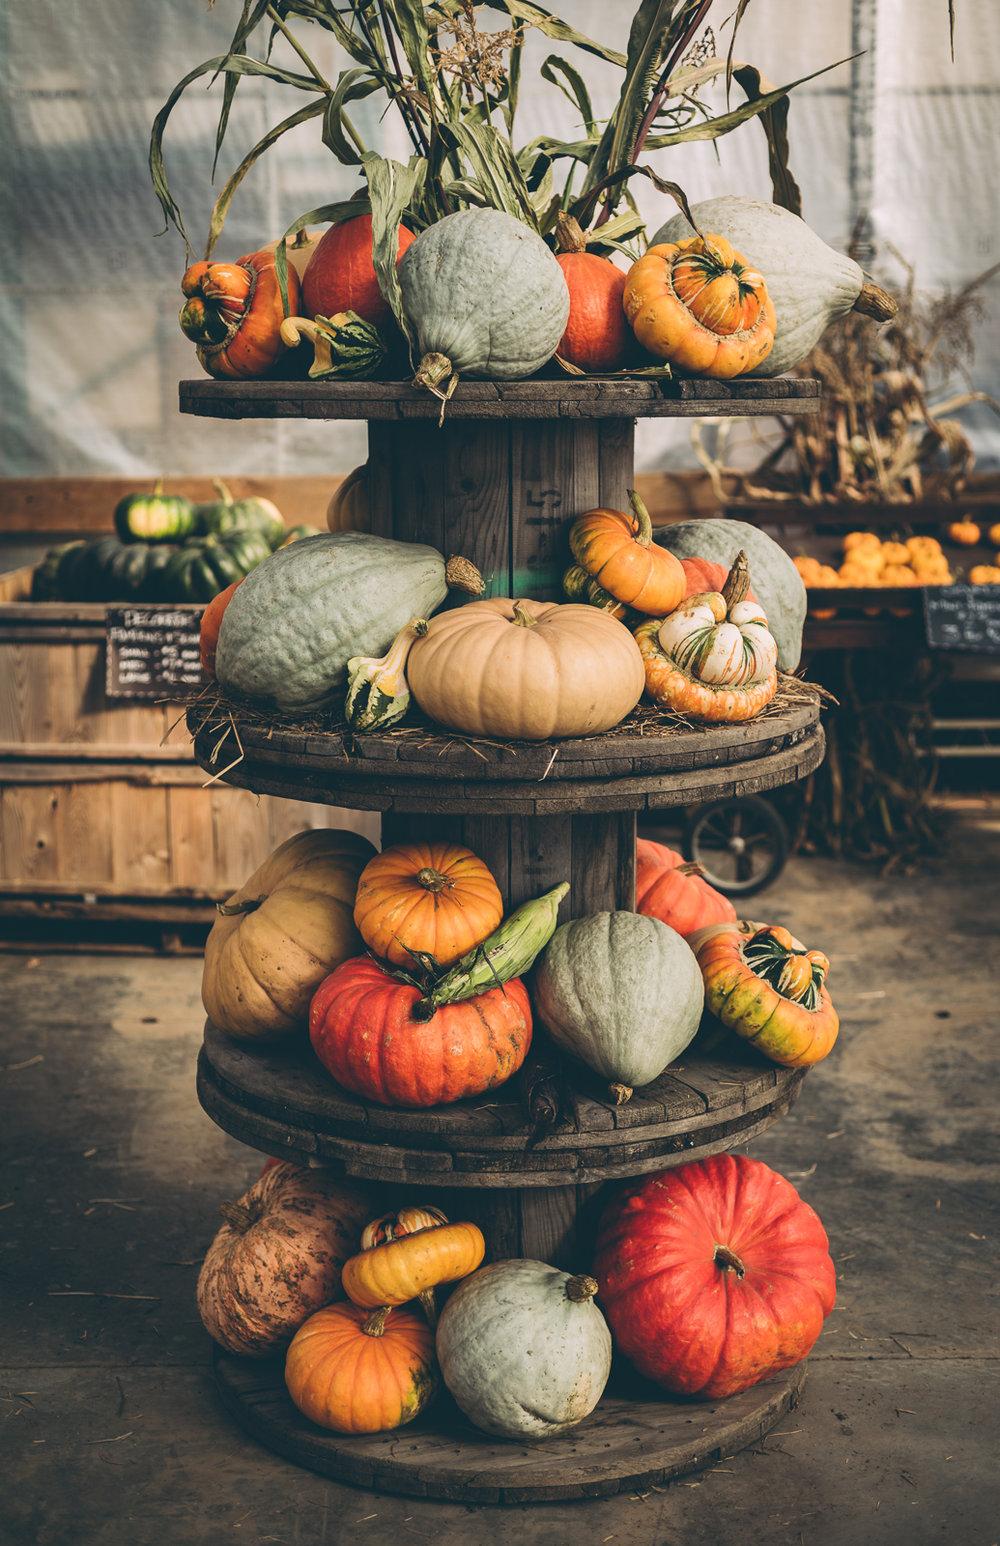 belluzfarms-pumpkinmania-2018-blog-55.jpg